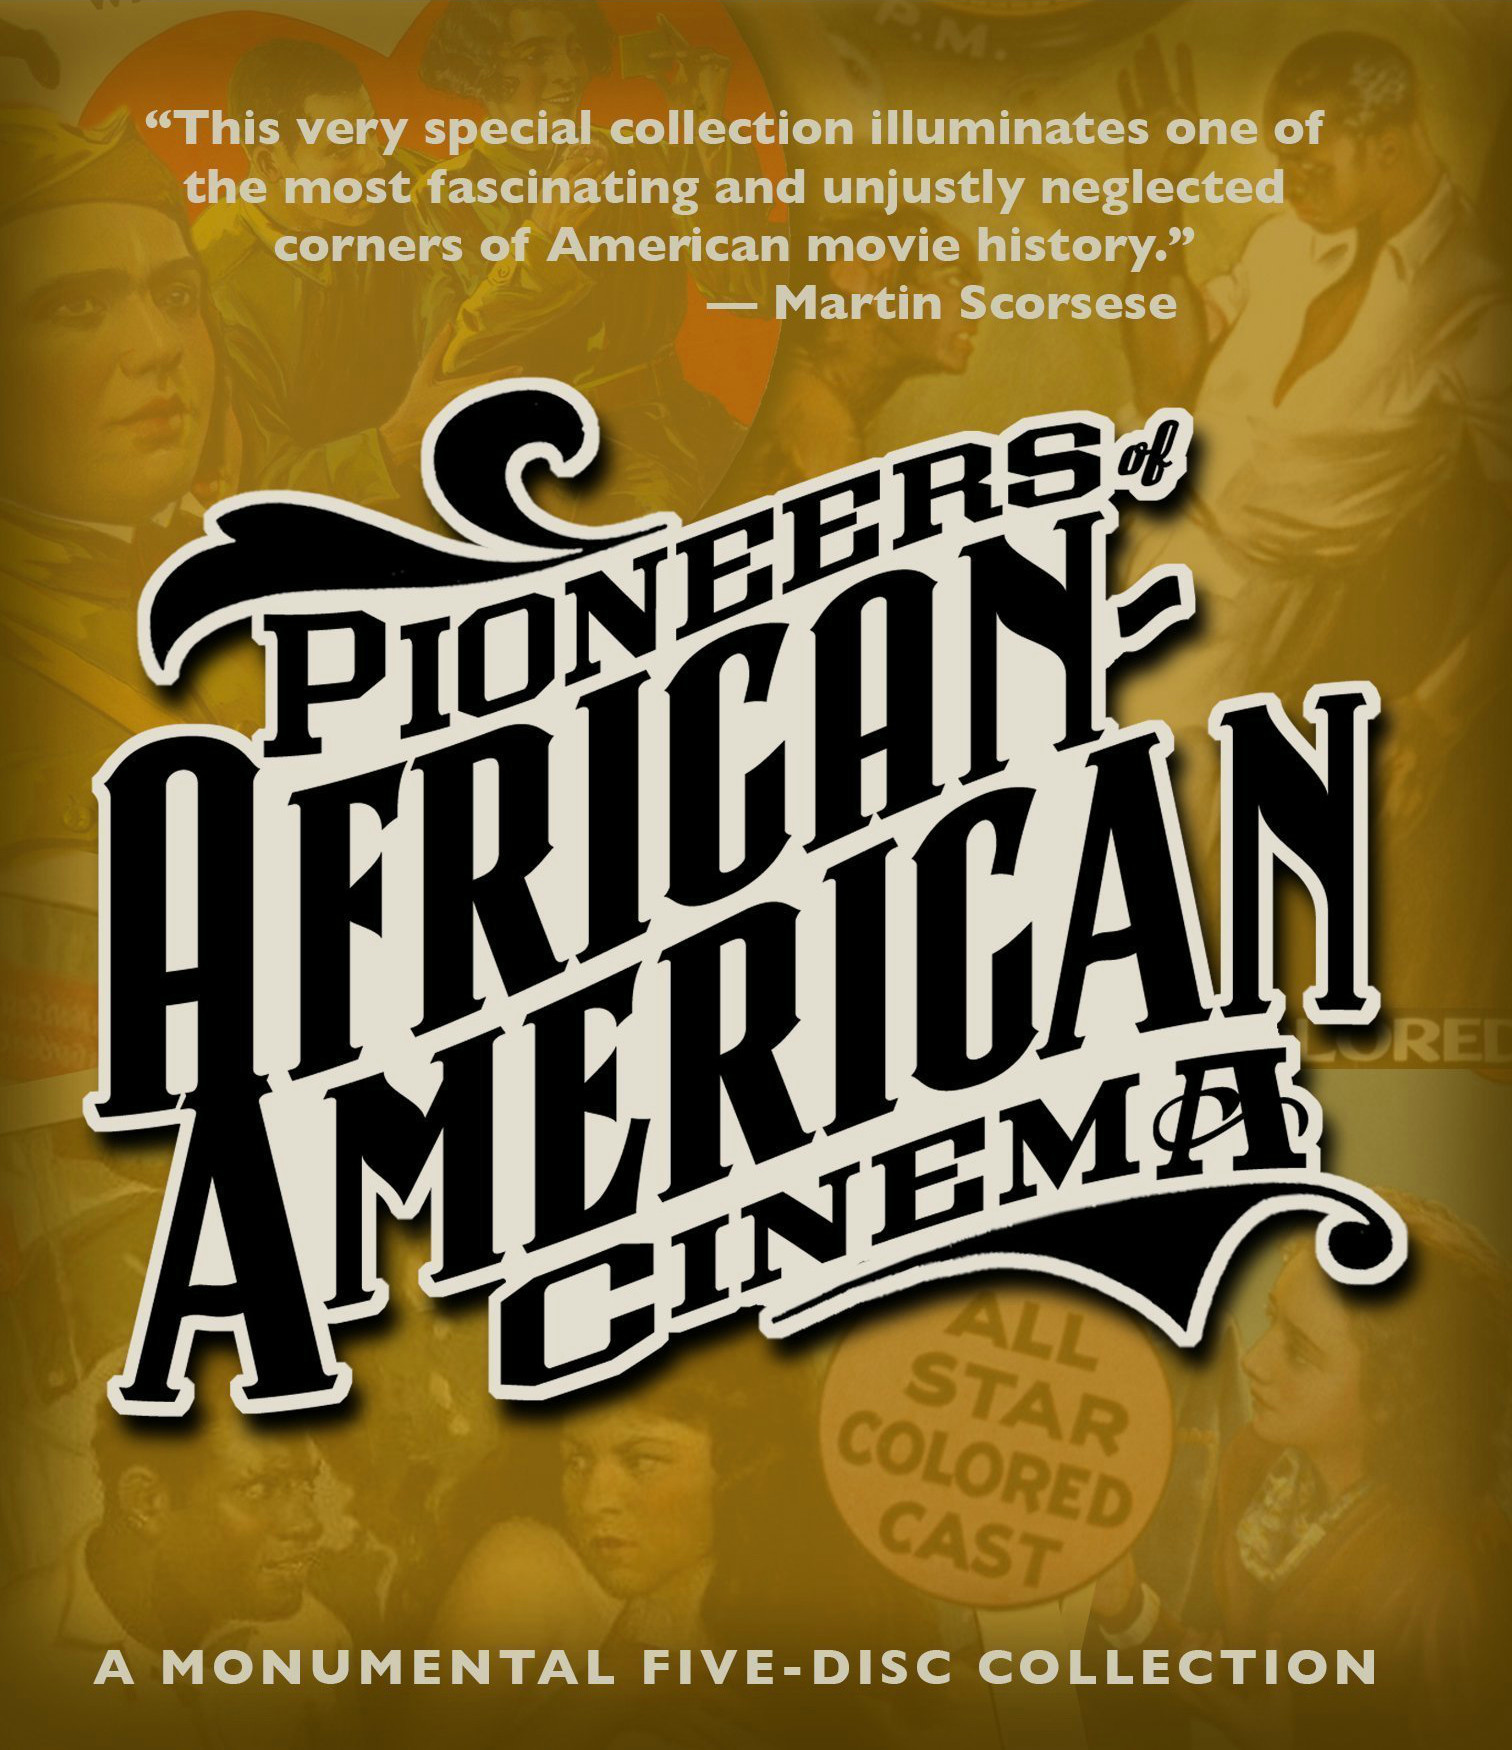 Pioneers of African-American Cinema: About the Restoration kapak